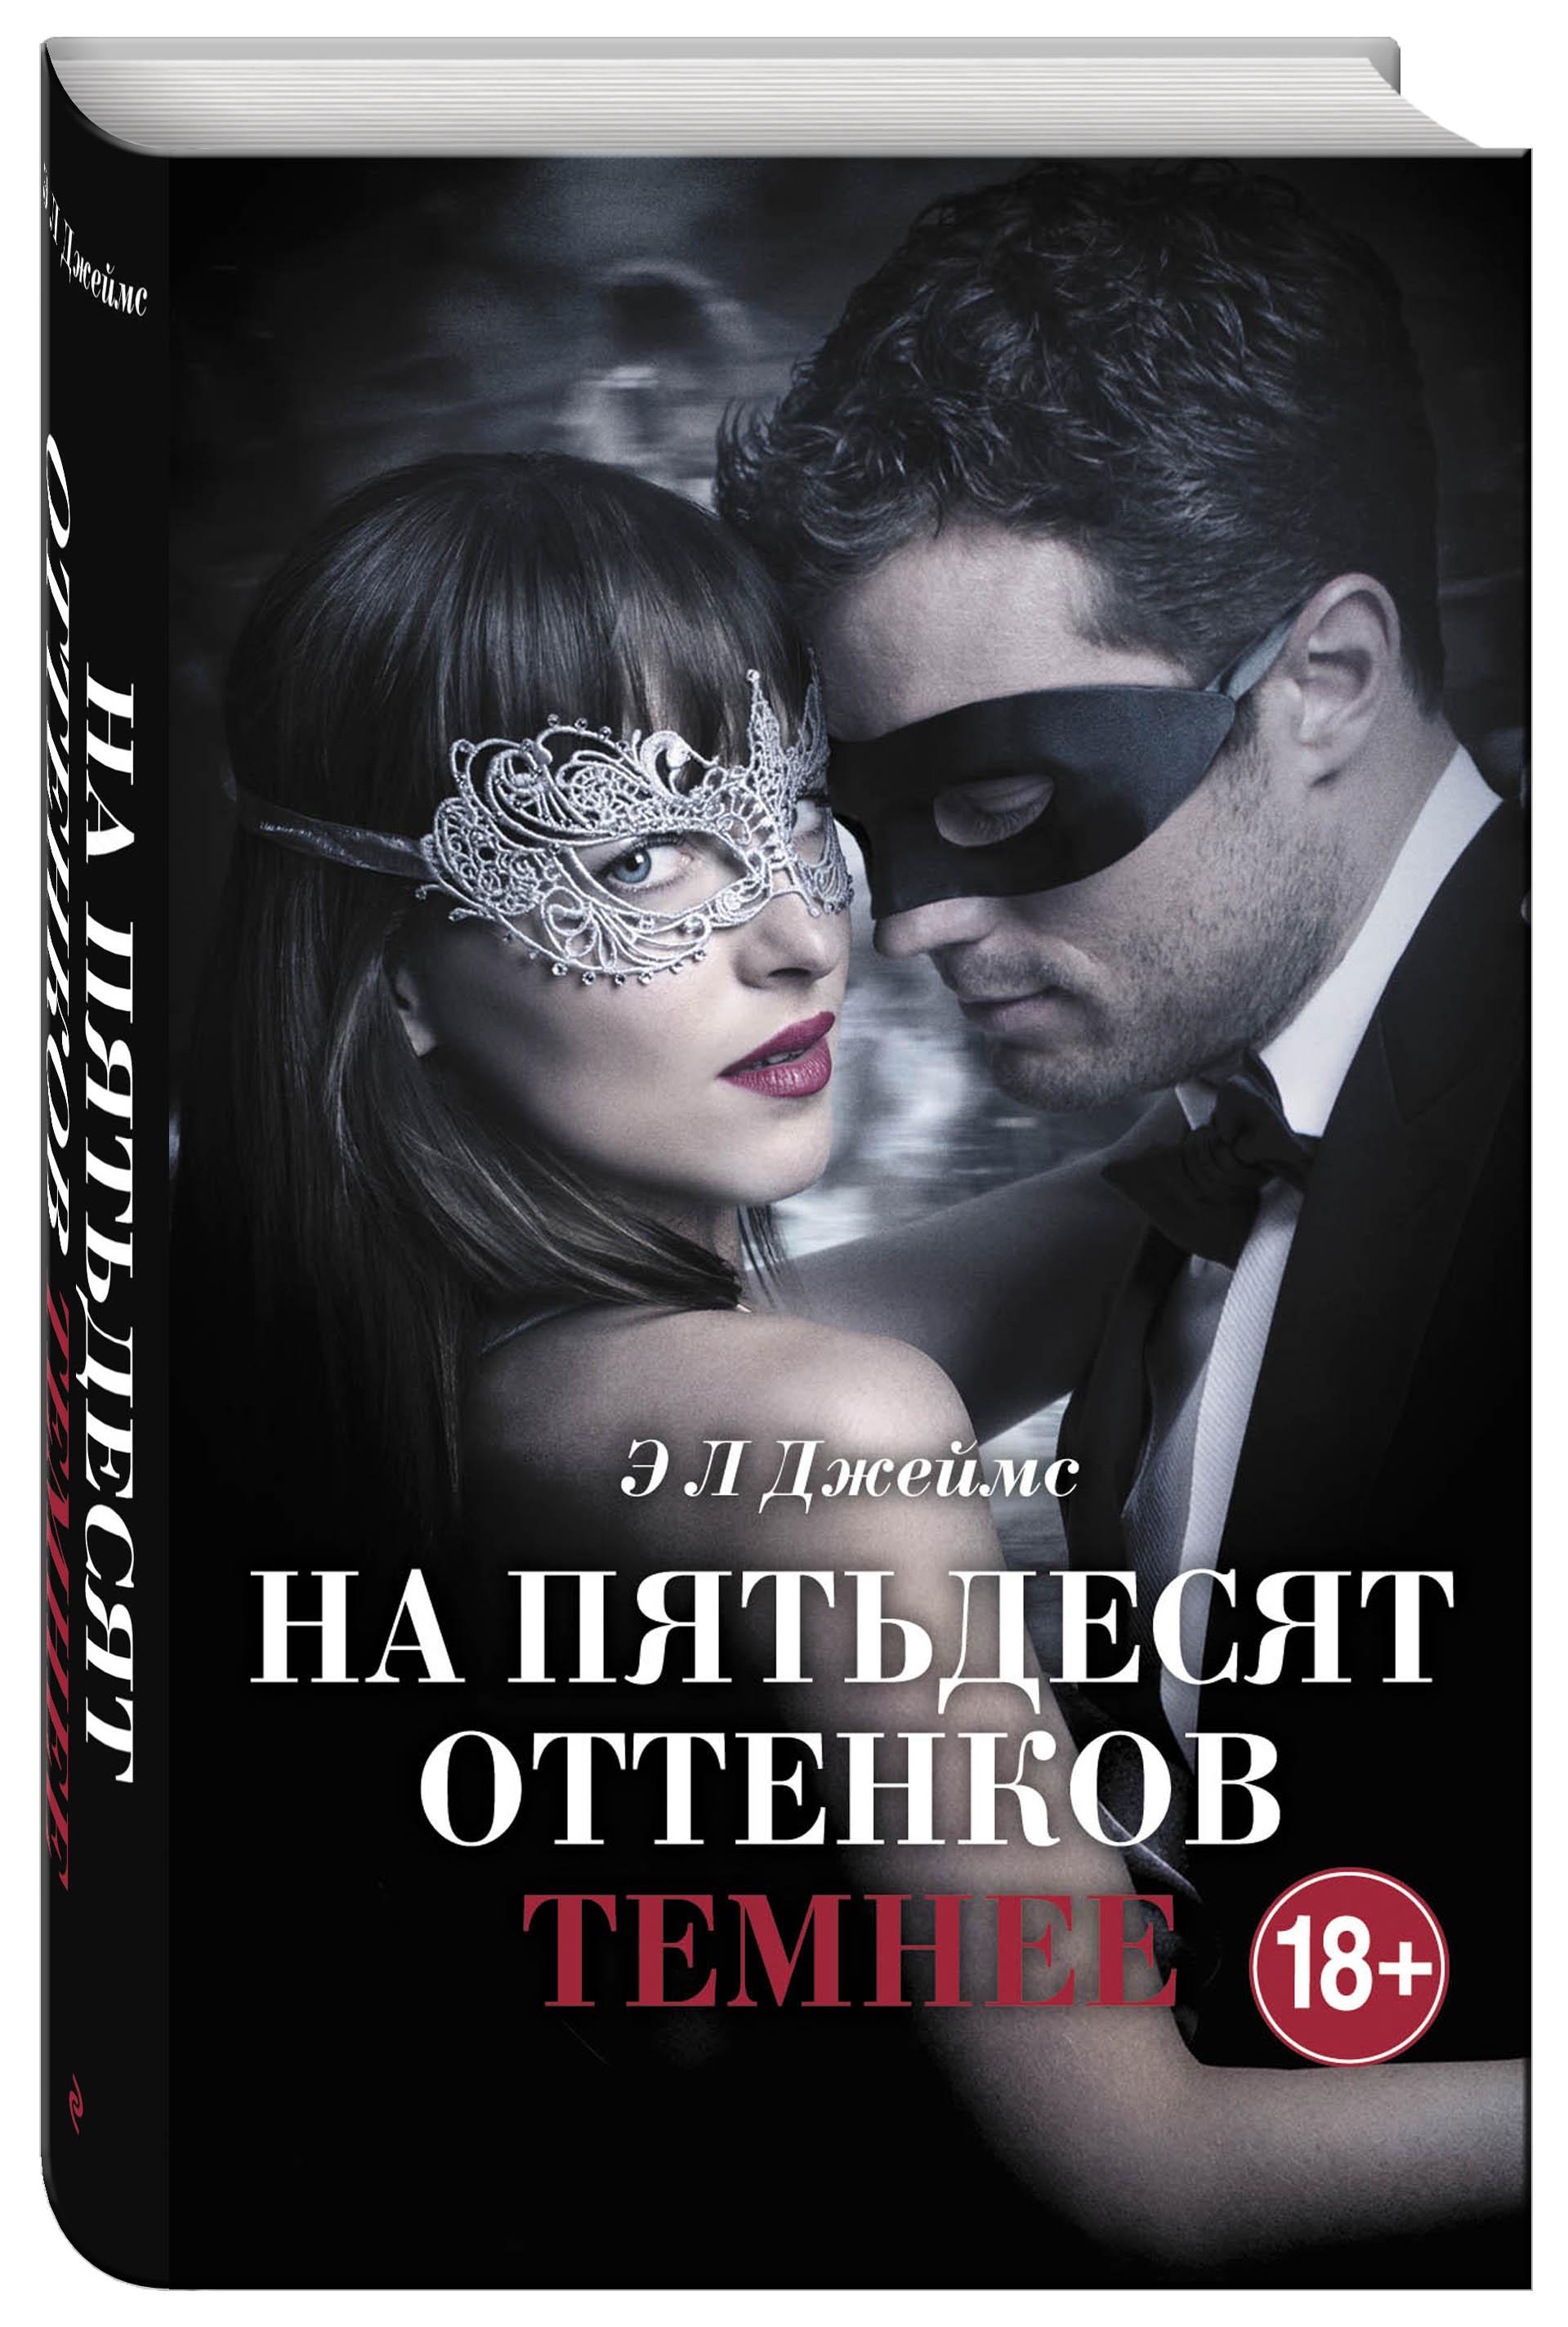 Джеймс Э Л На пятьдесят оттенков темнее + суперобложка ISBN: 978-5-699-94964-9